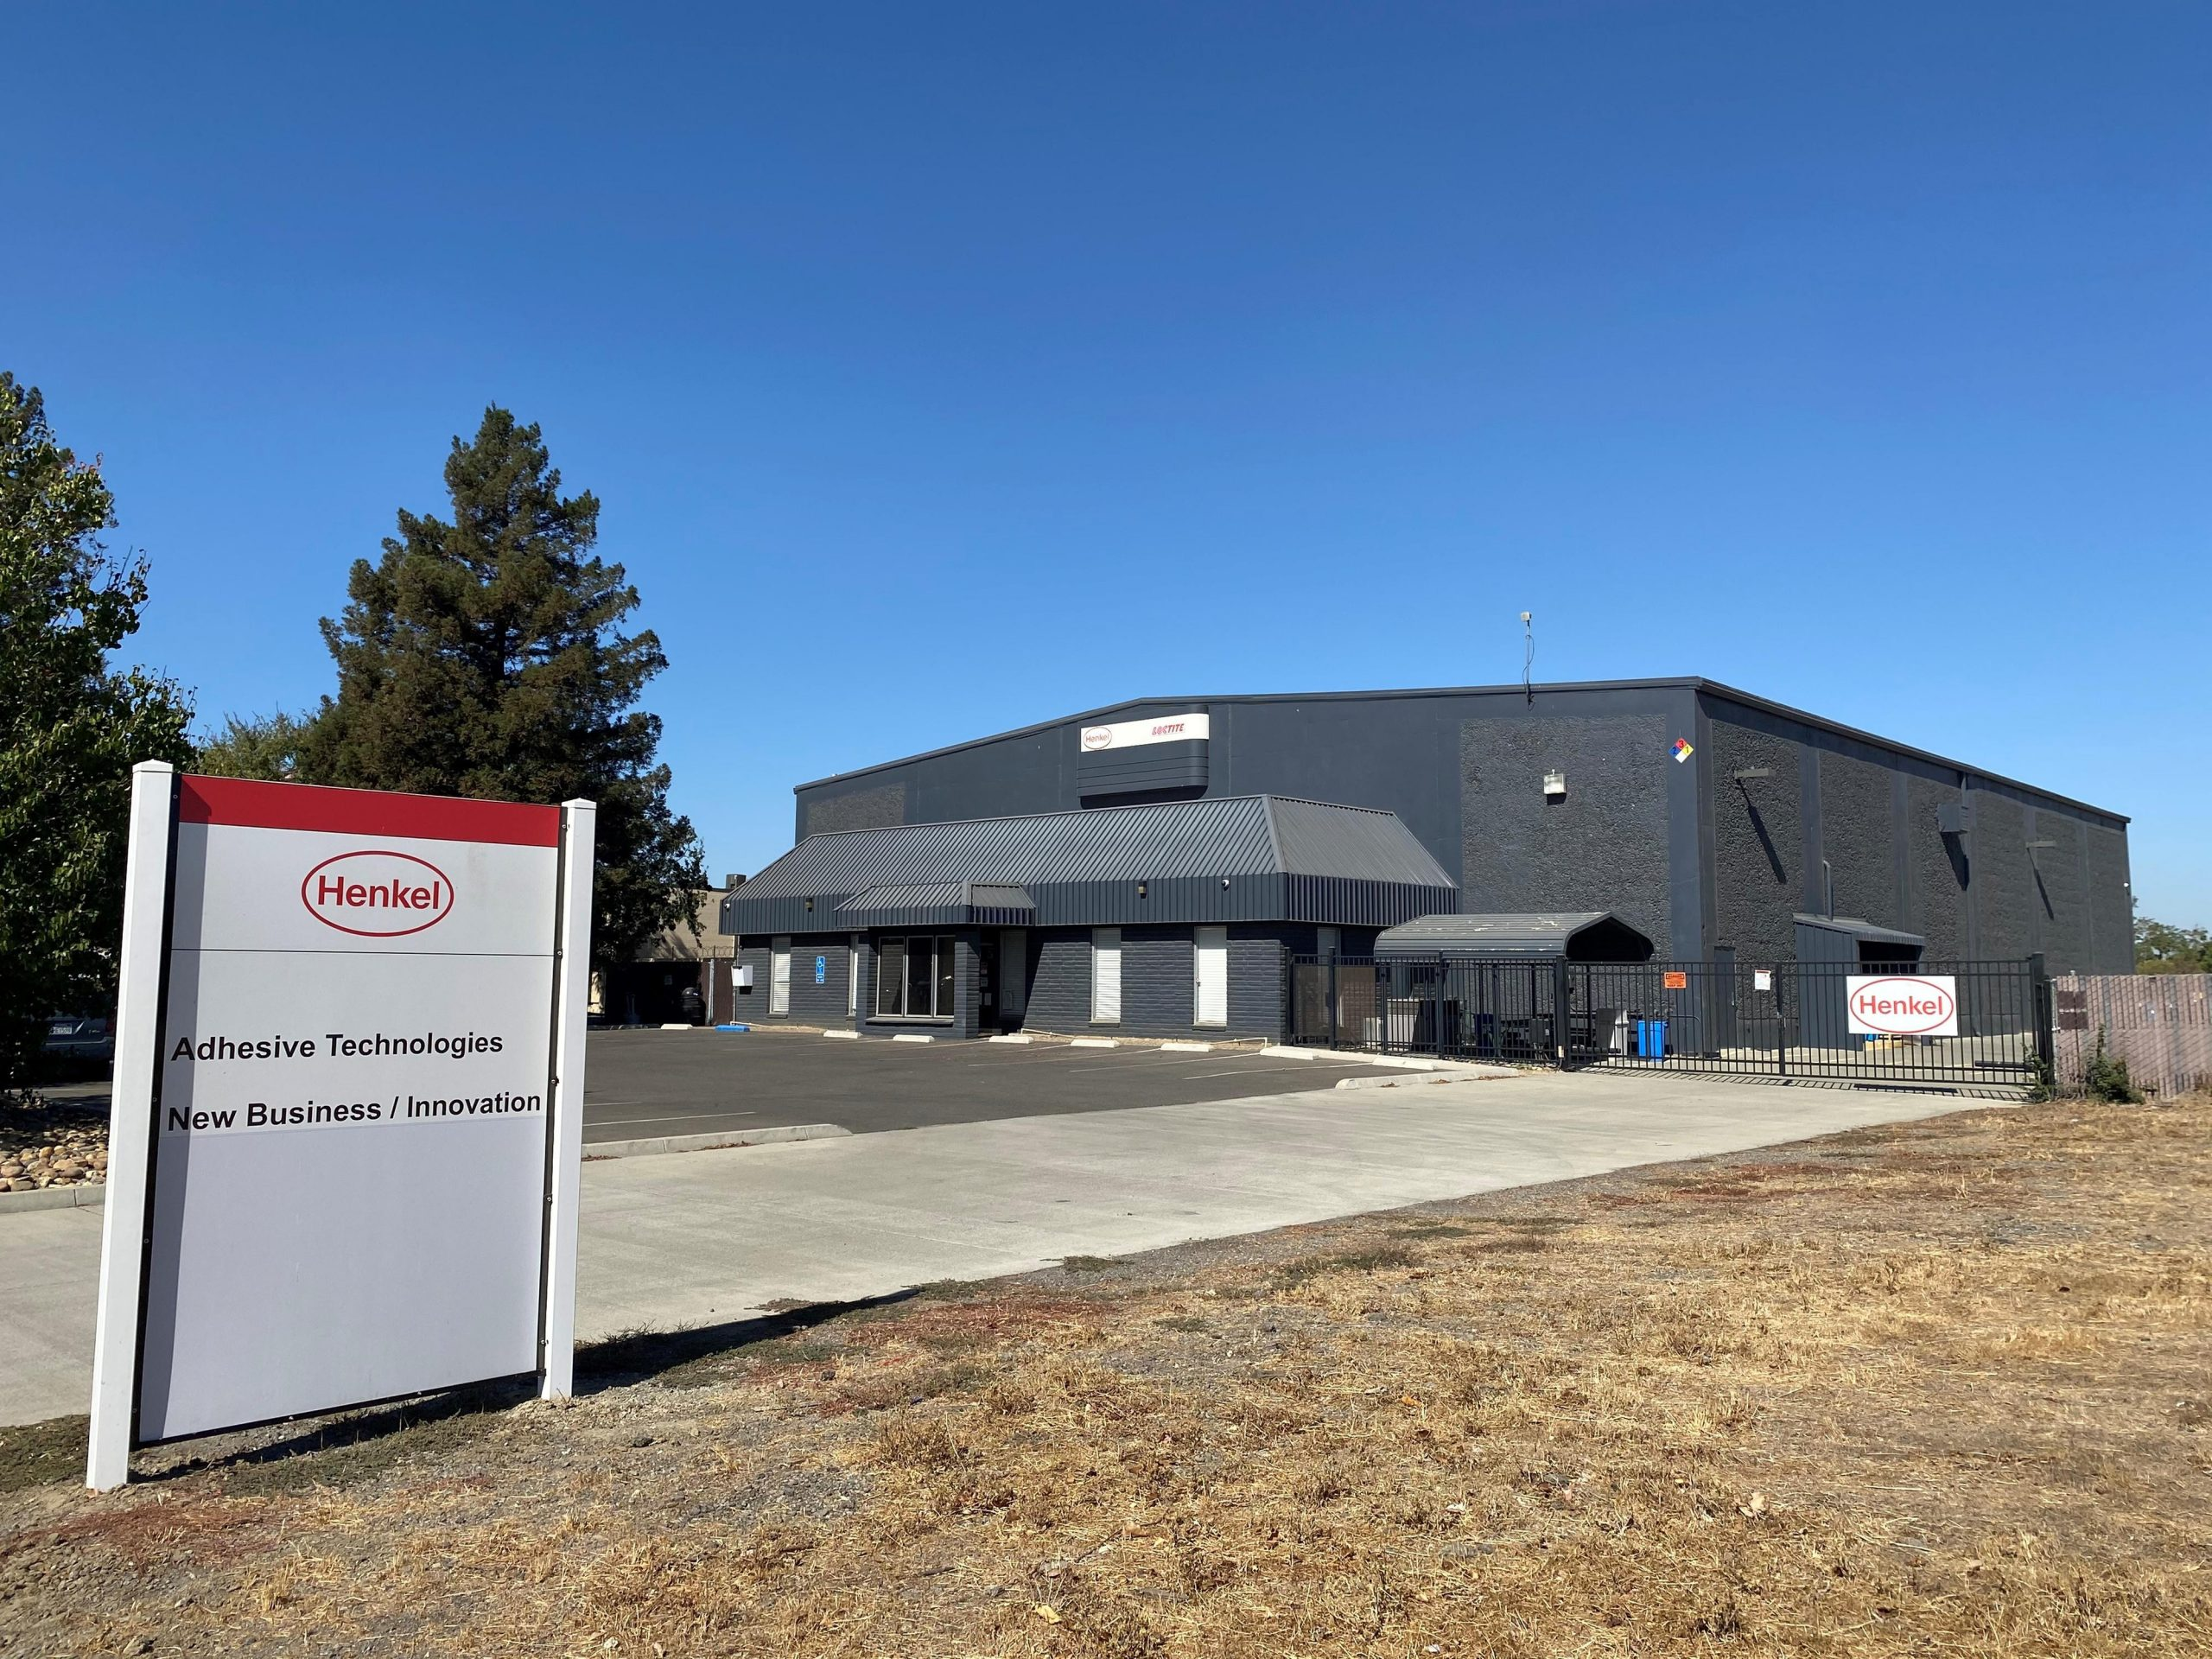 Henkel's 3D printing production facility in Dixon, California. Photo via Henkel.